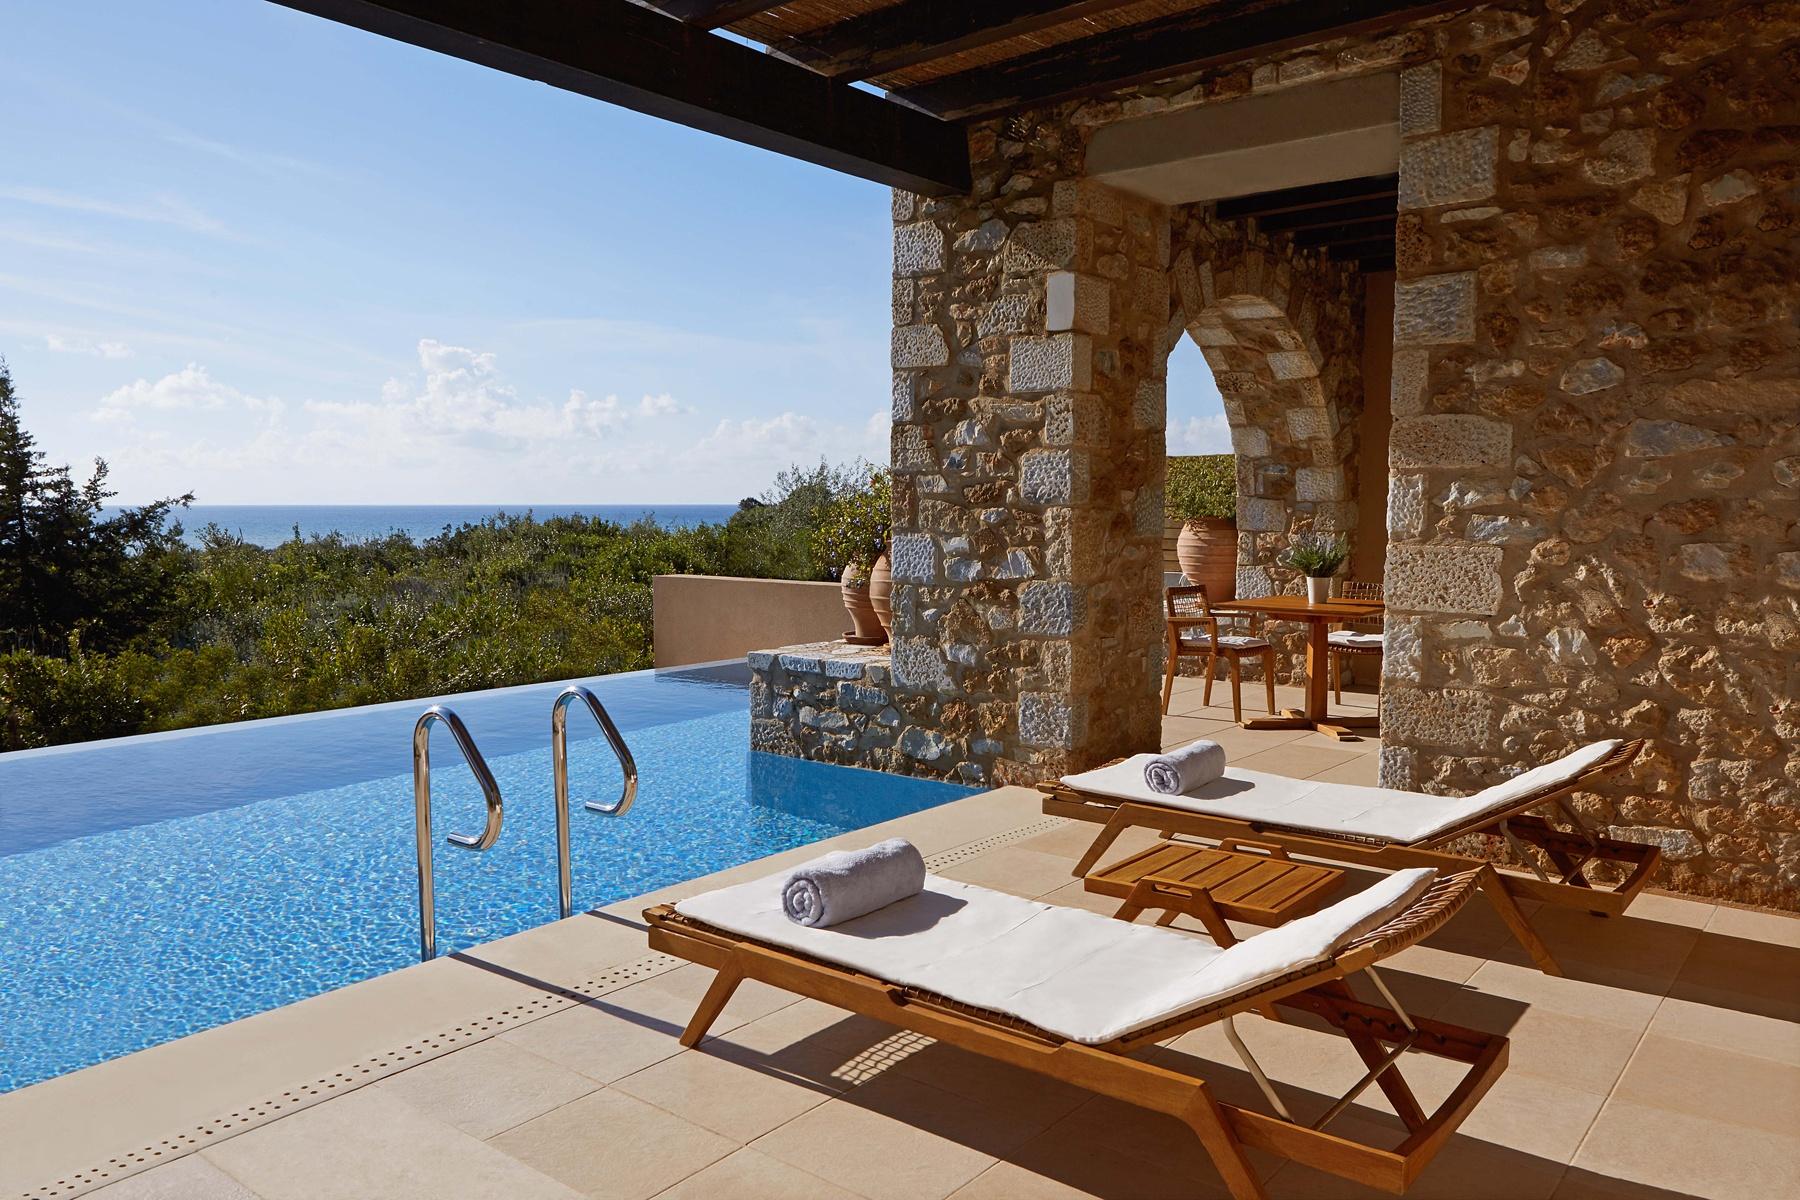 Villa with Private Pool at The Westin Resort Costa Navarino